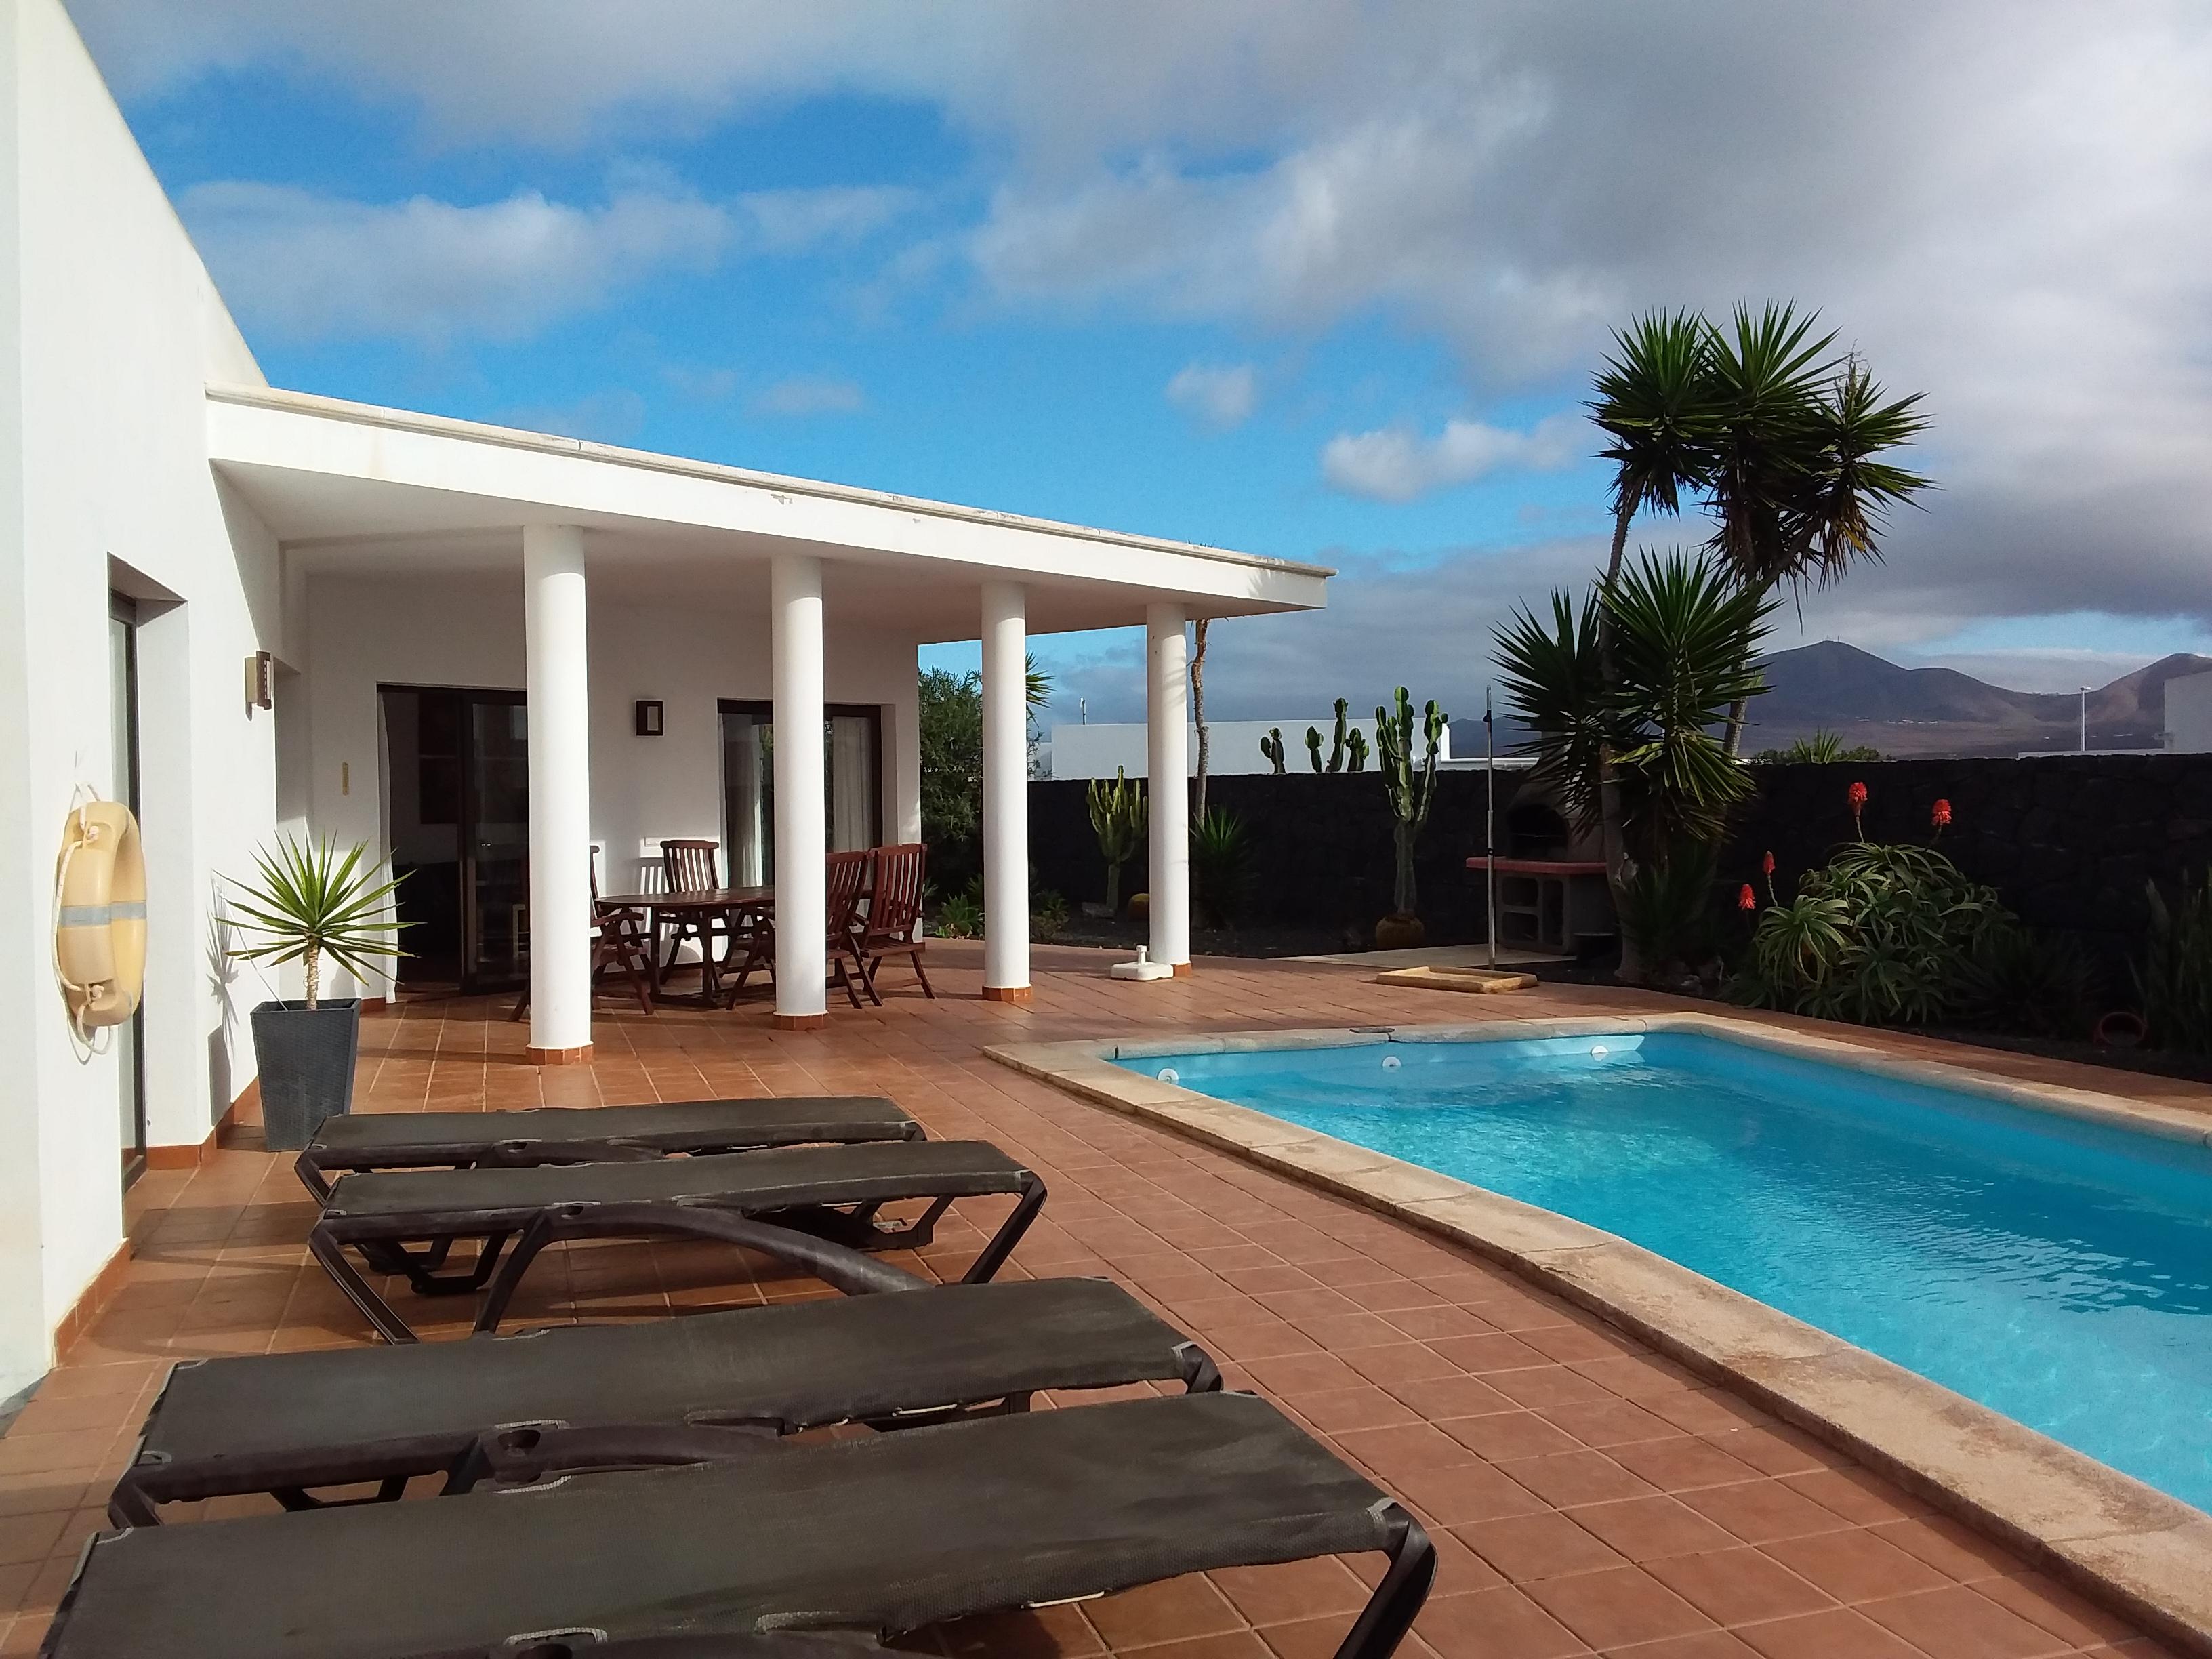 Spacious Detached Villa With Private Pool and Mountain Views – Villas Blancas